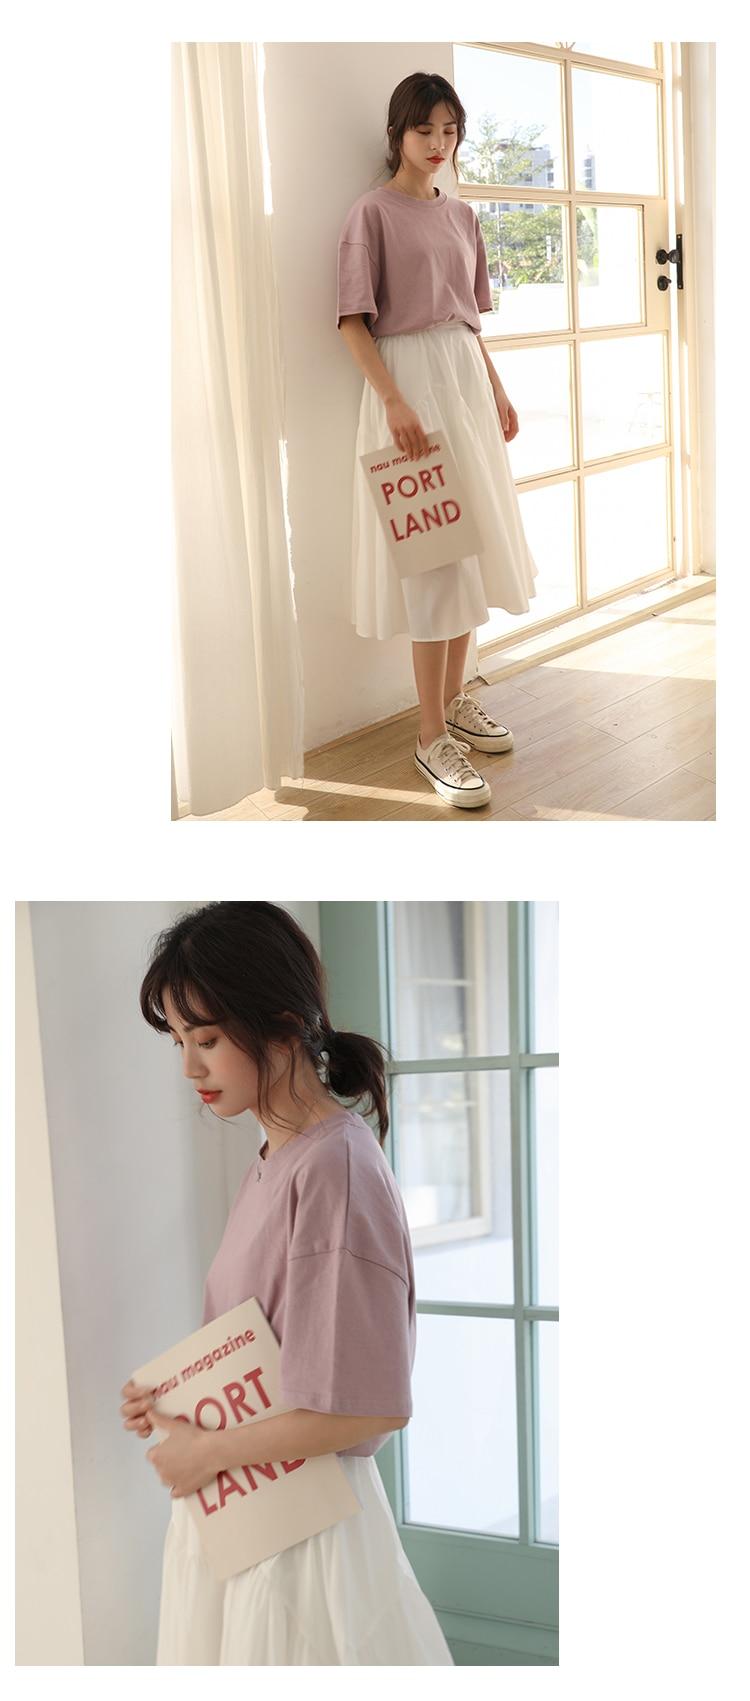 Hef1fccb32df446288d20df7fe83565f02 - Summer O-Neck Short Sleeves Minimalist Loose Basic T-Shirt